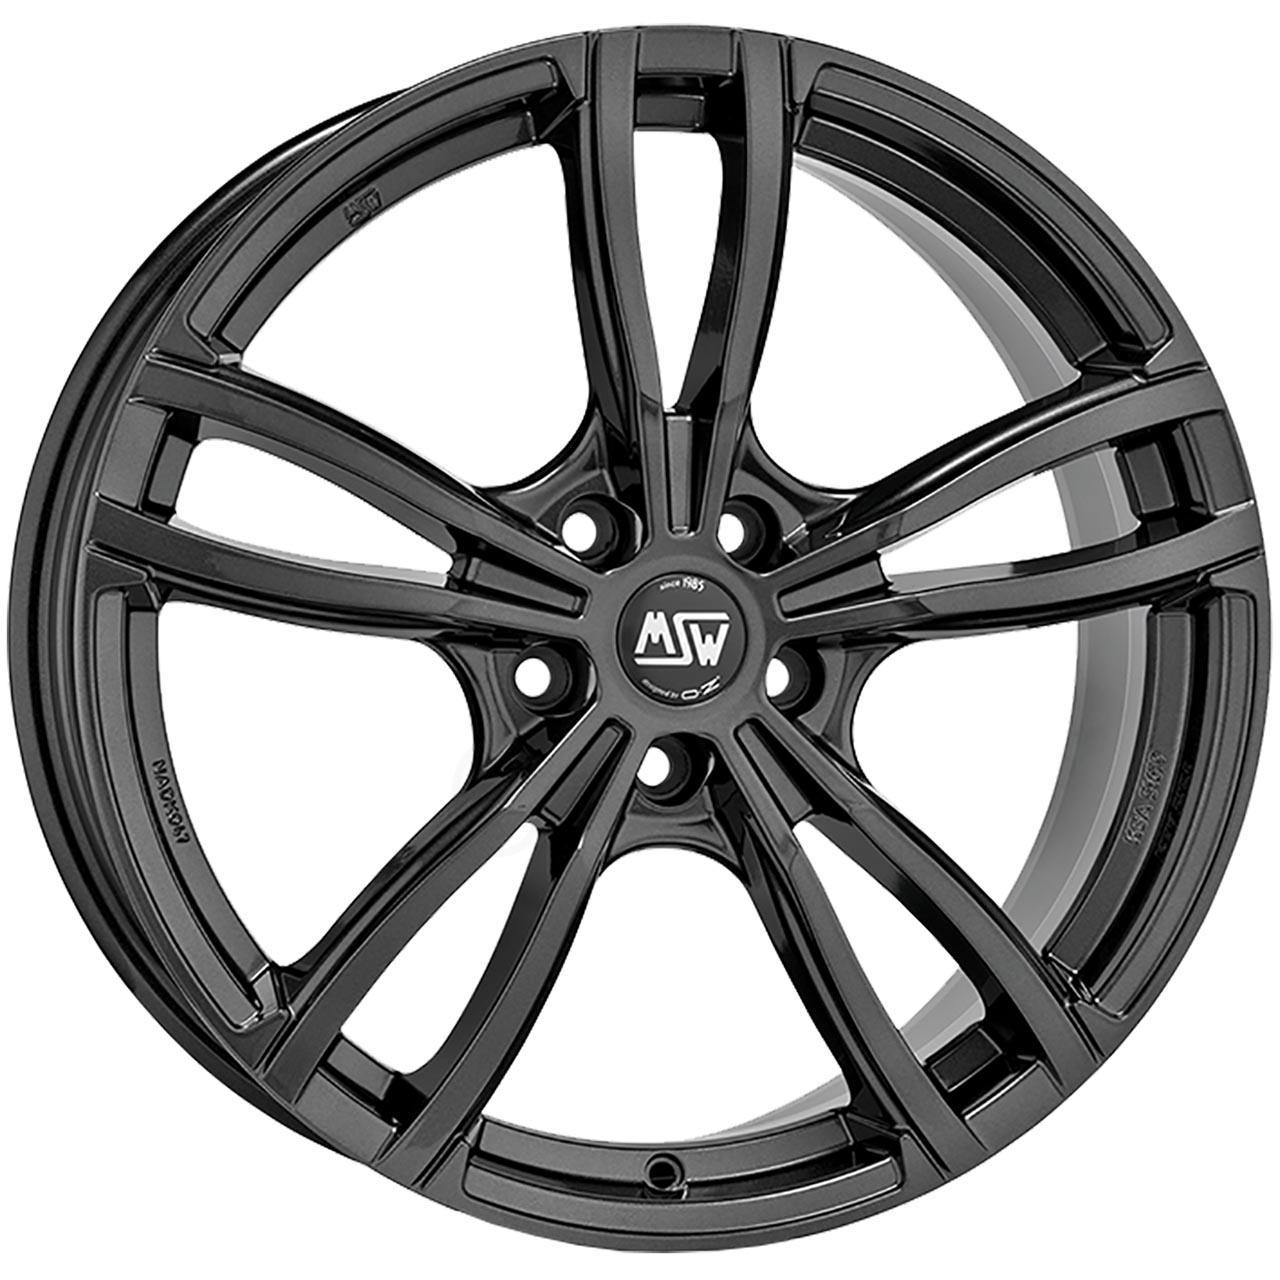 MSW Msw 73 Gloss dark grey 8x18 5x112 ET35